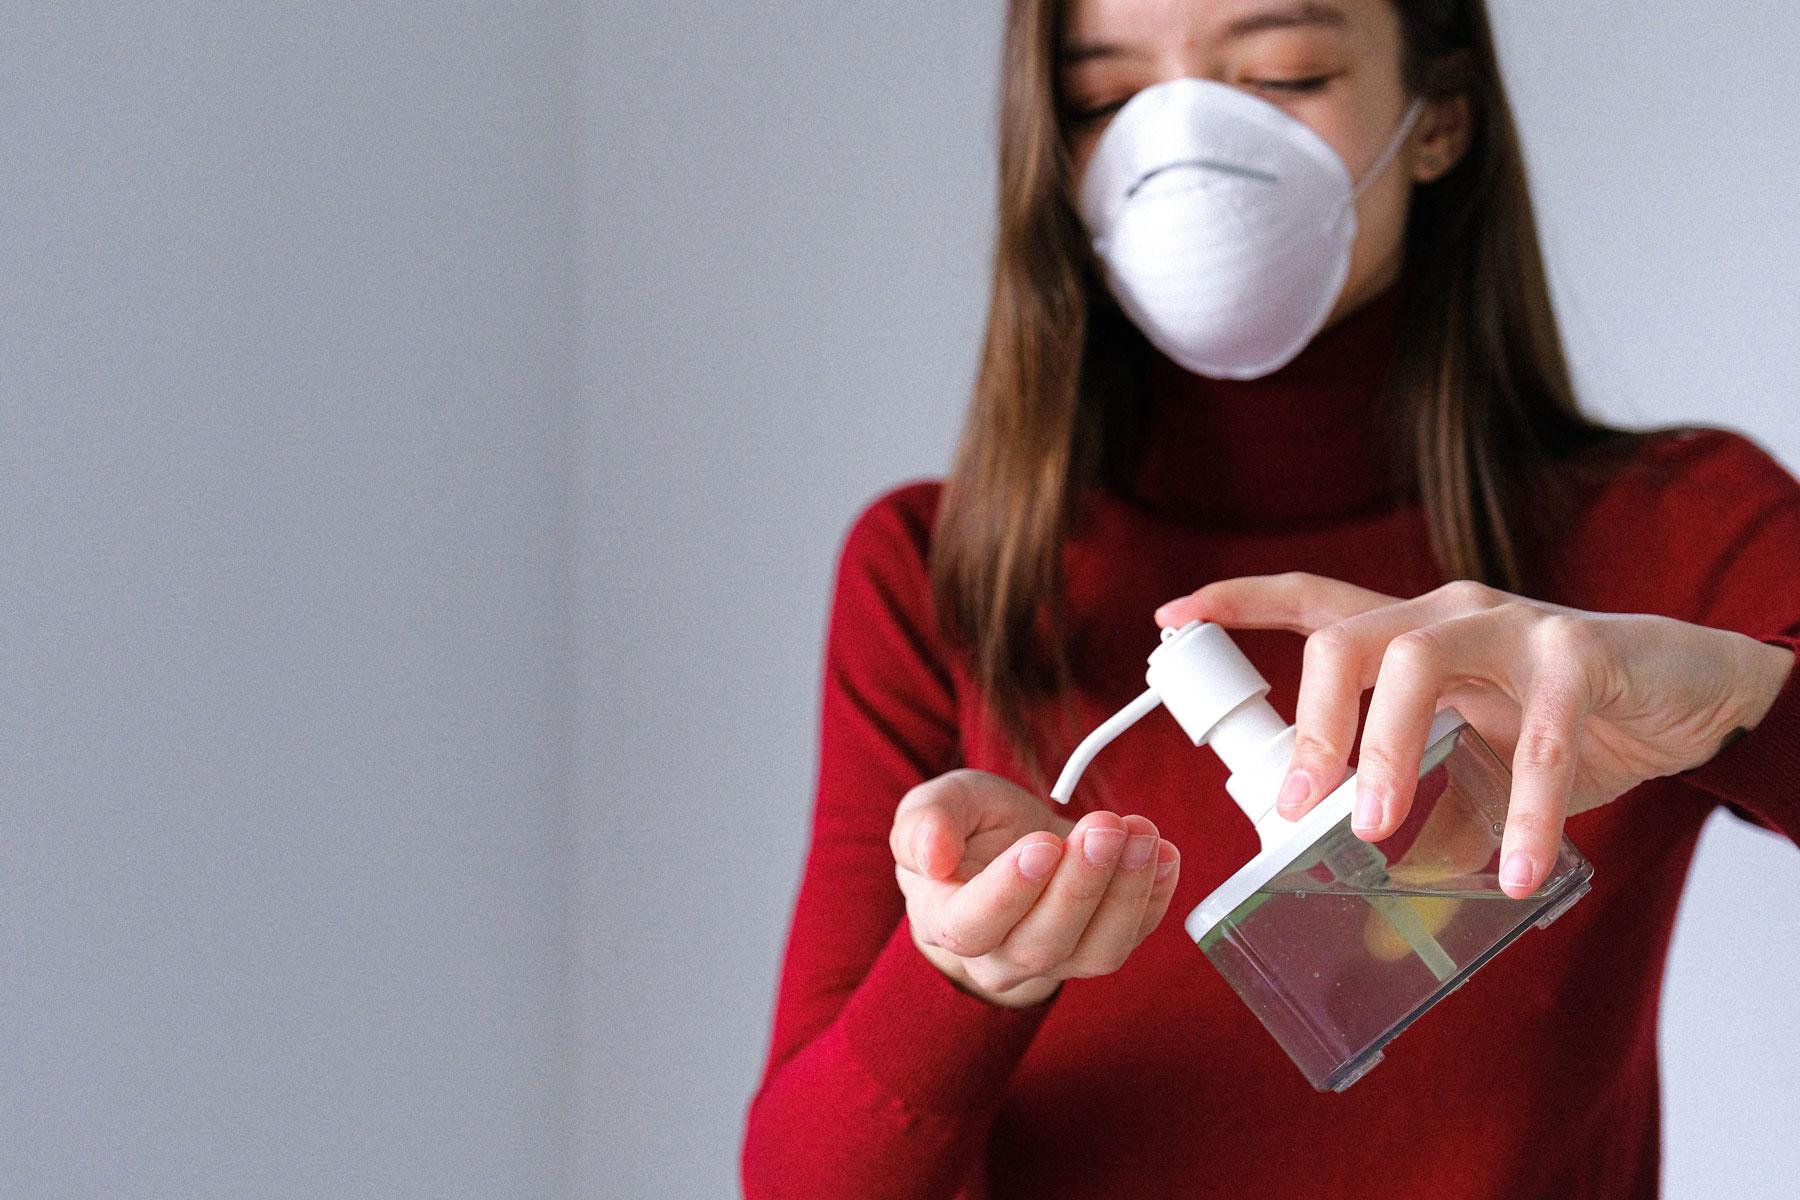 B.C. immunization group urges prevention ahead of influenza season